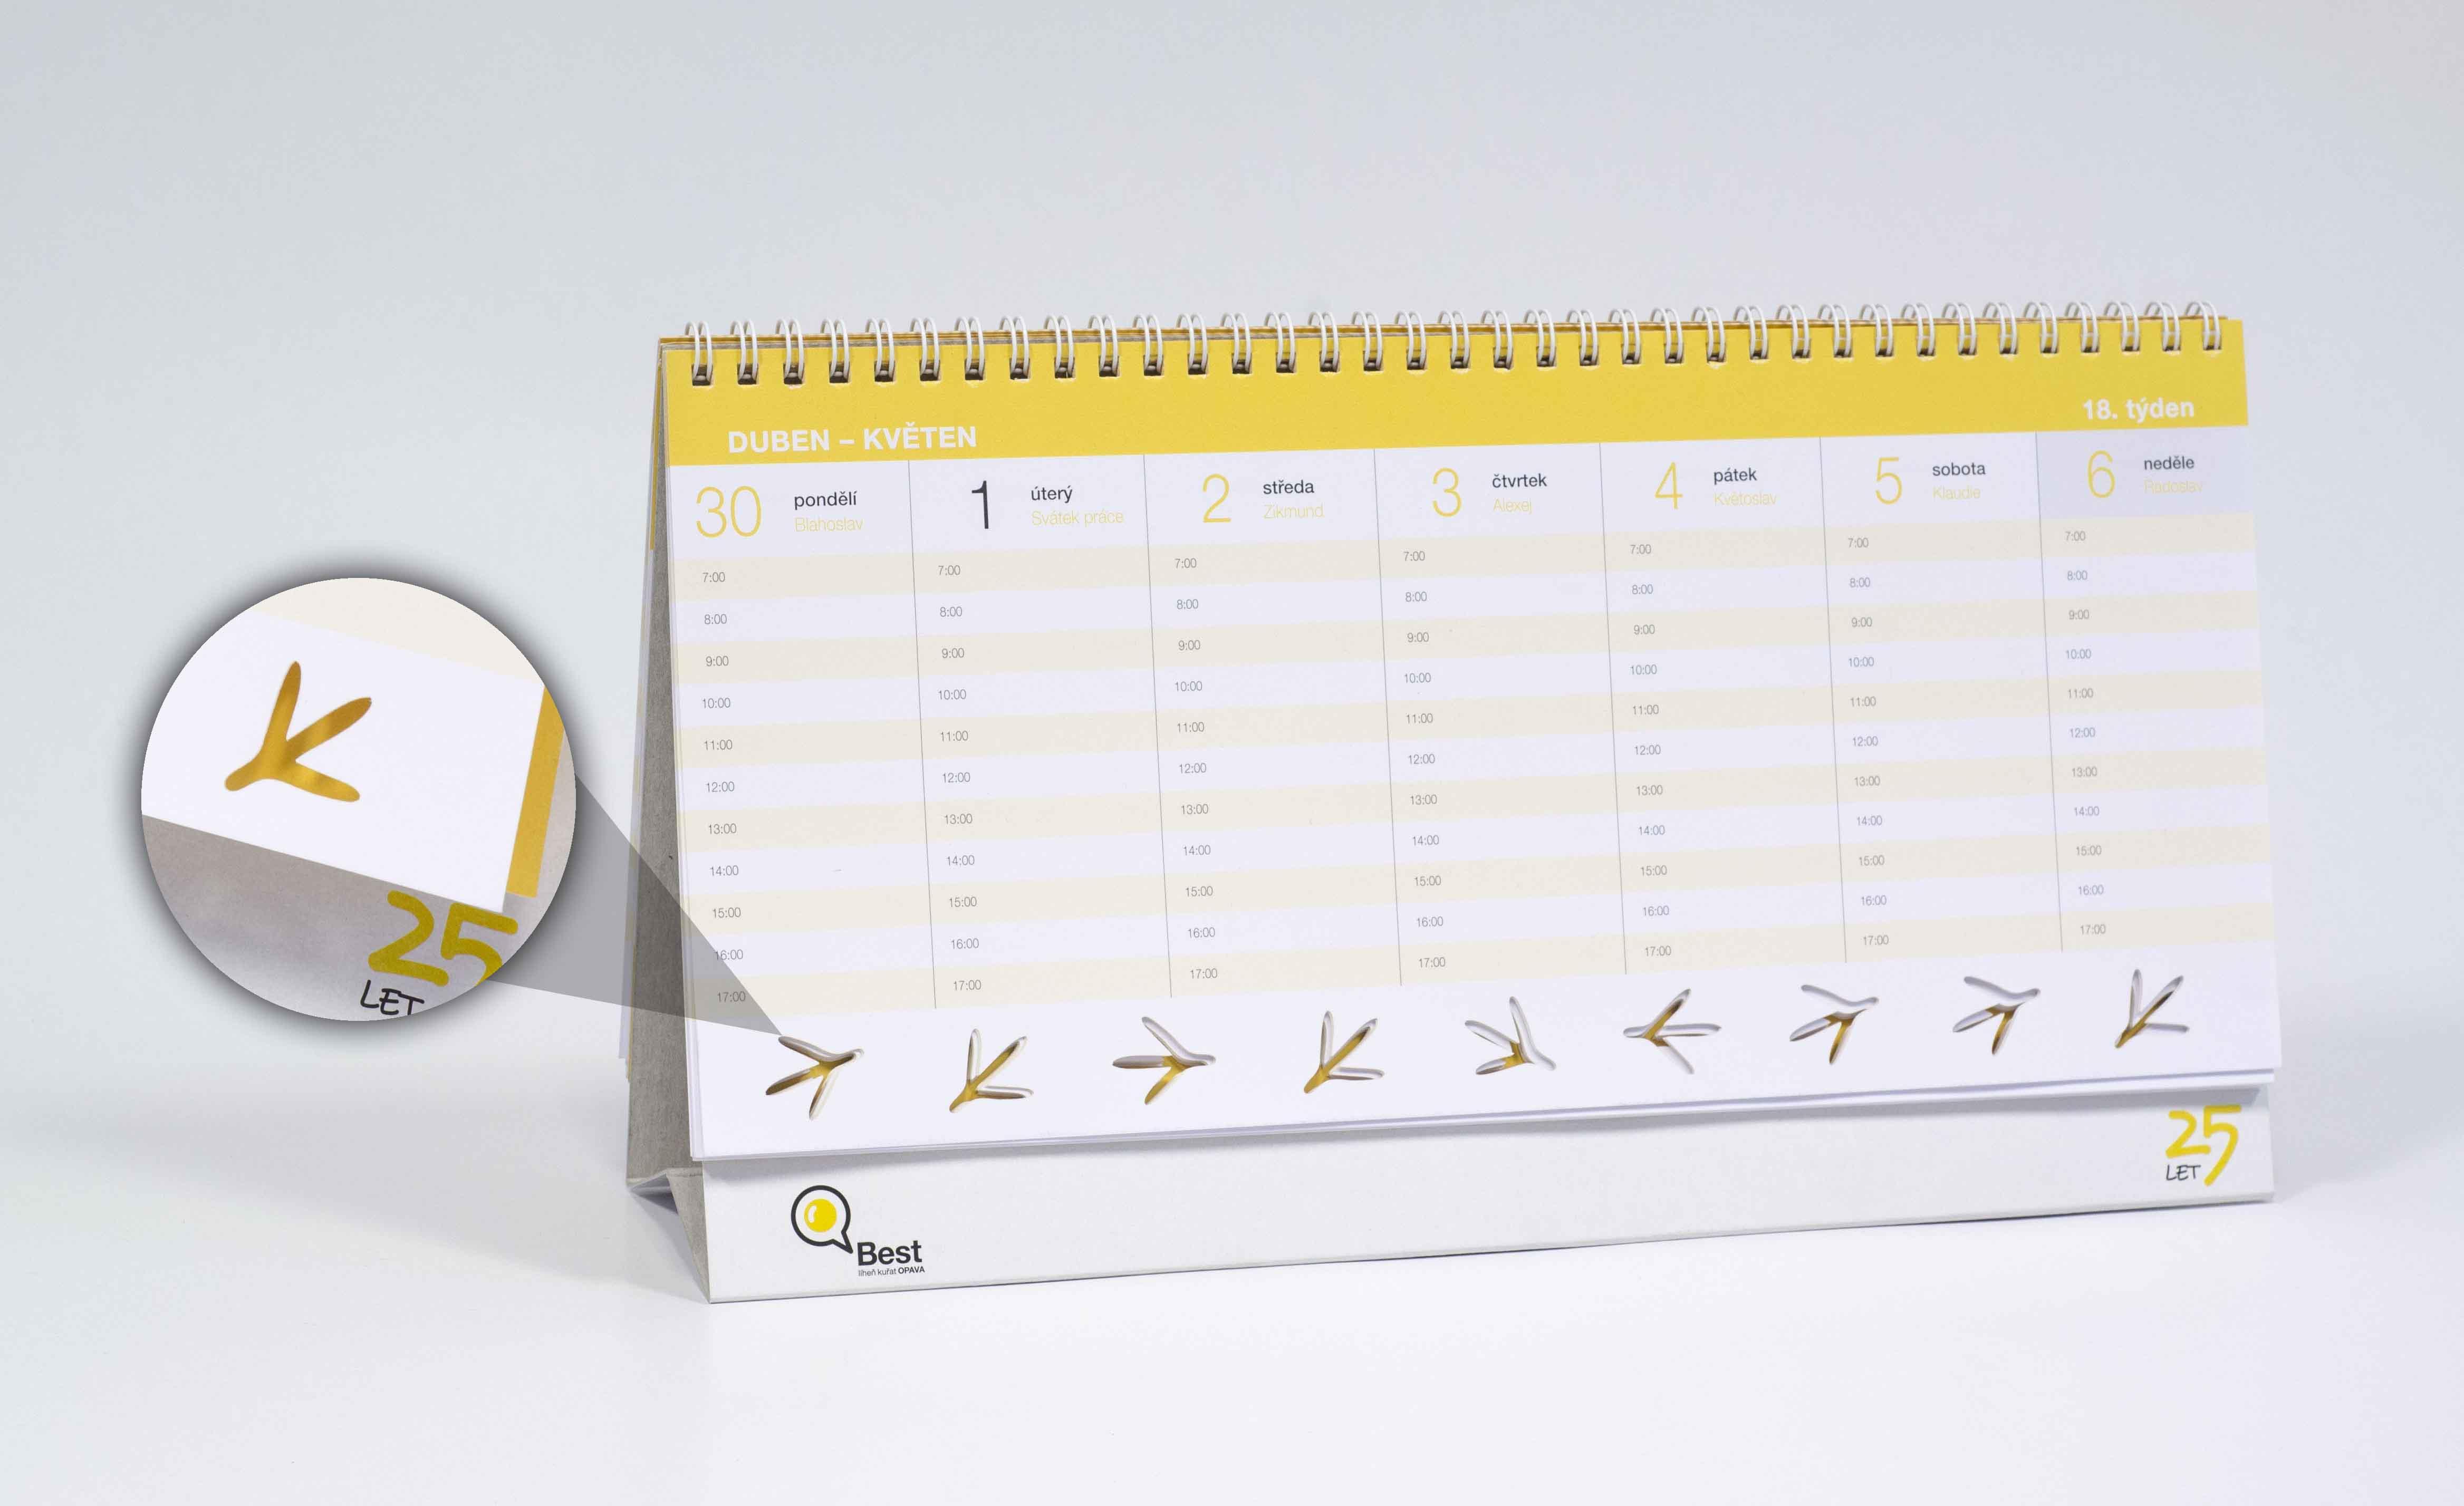 stolni-kalendar-s-tvarovym-vysekem.jpg